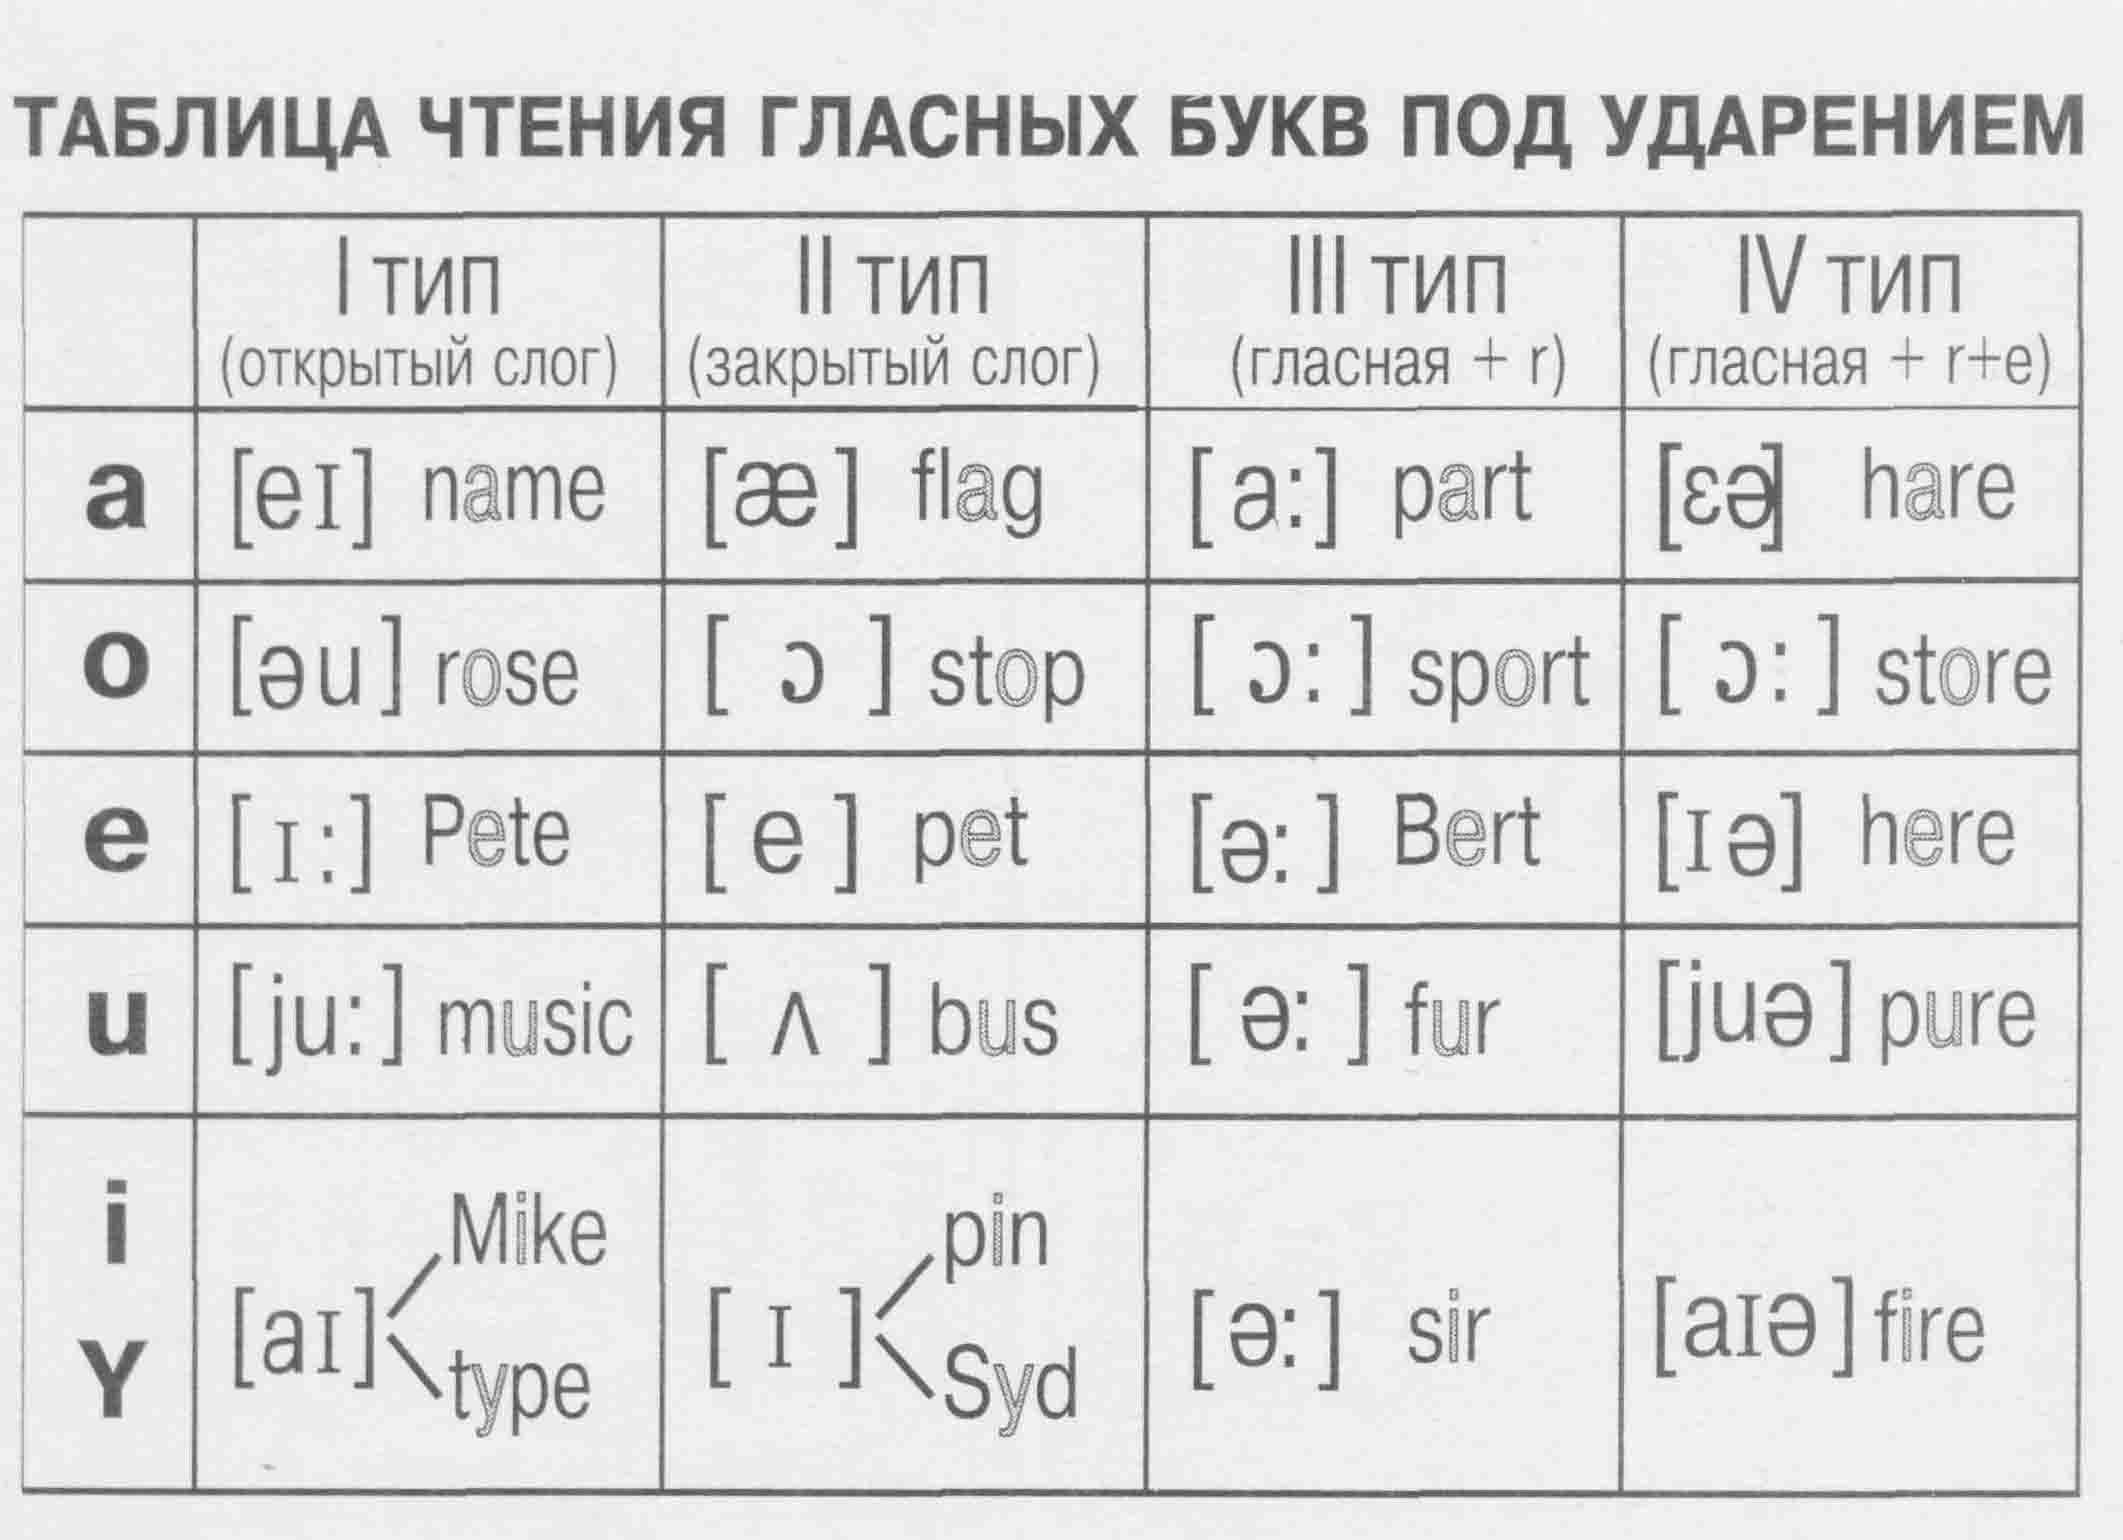 таблица с произношением испанских